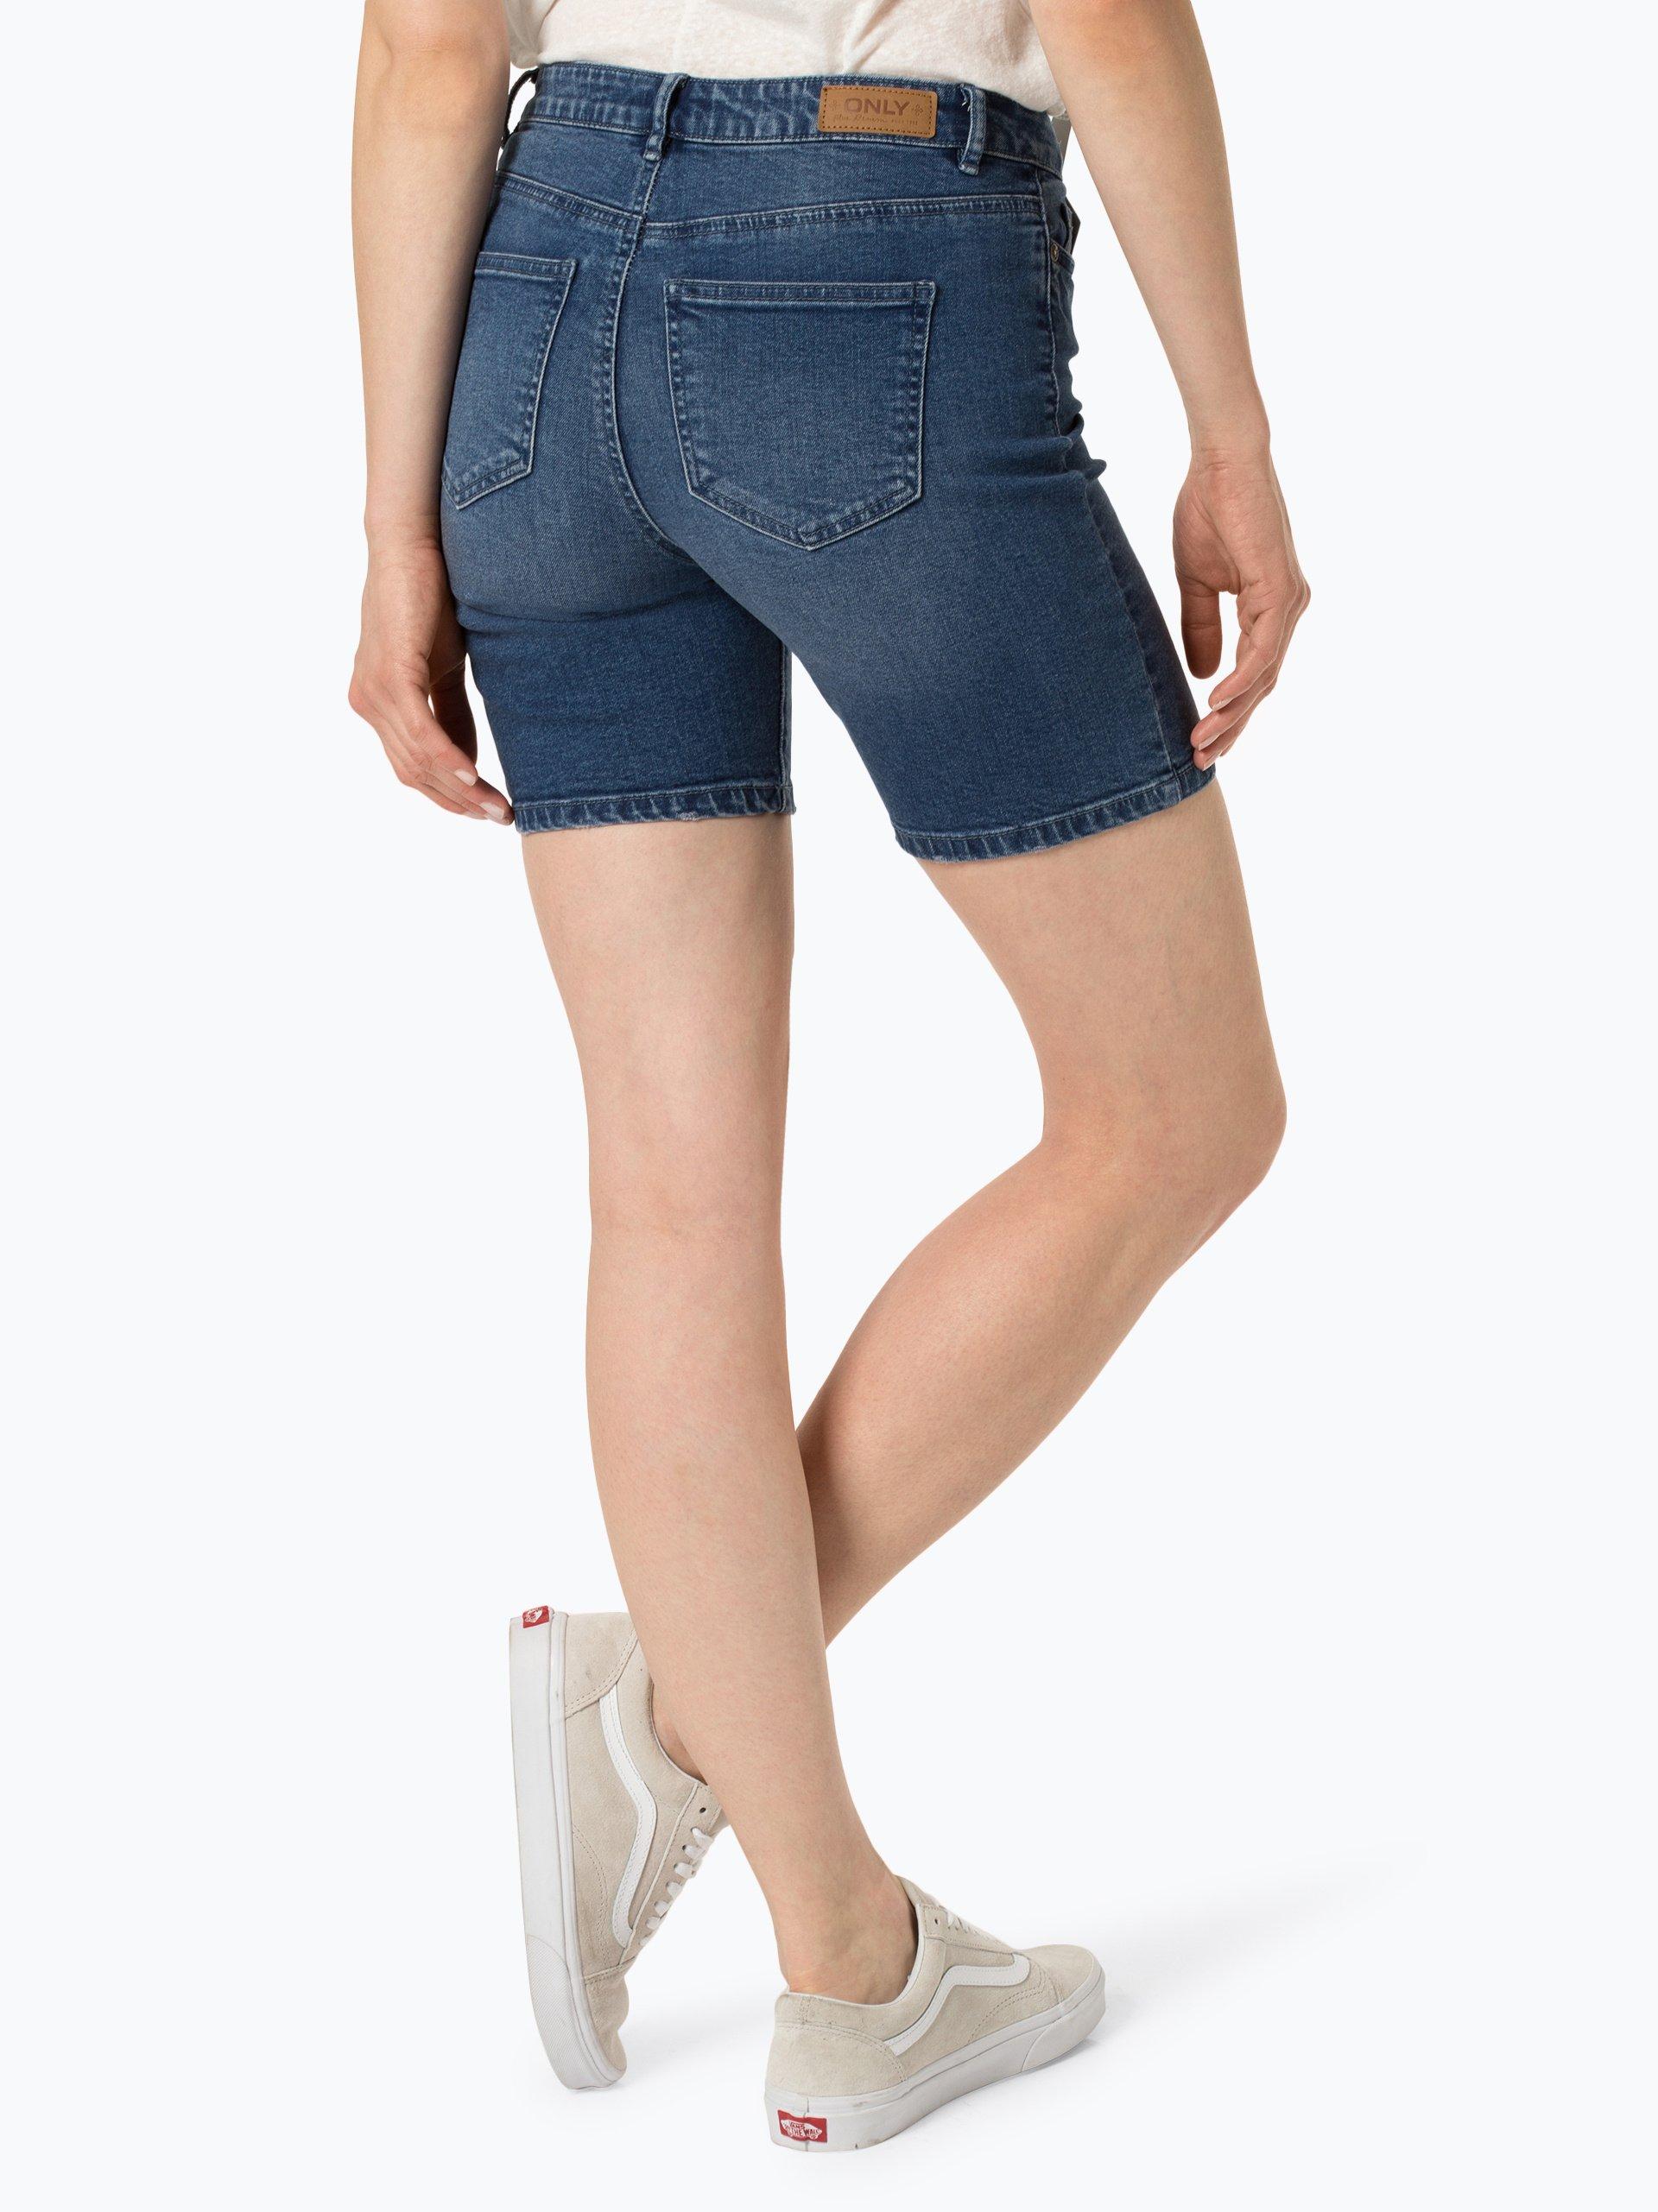 ONLY Damen Jeansshorts - Corin